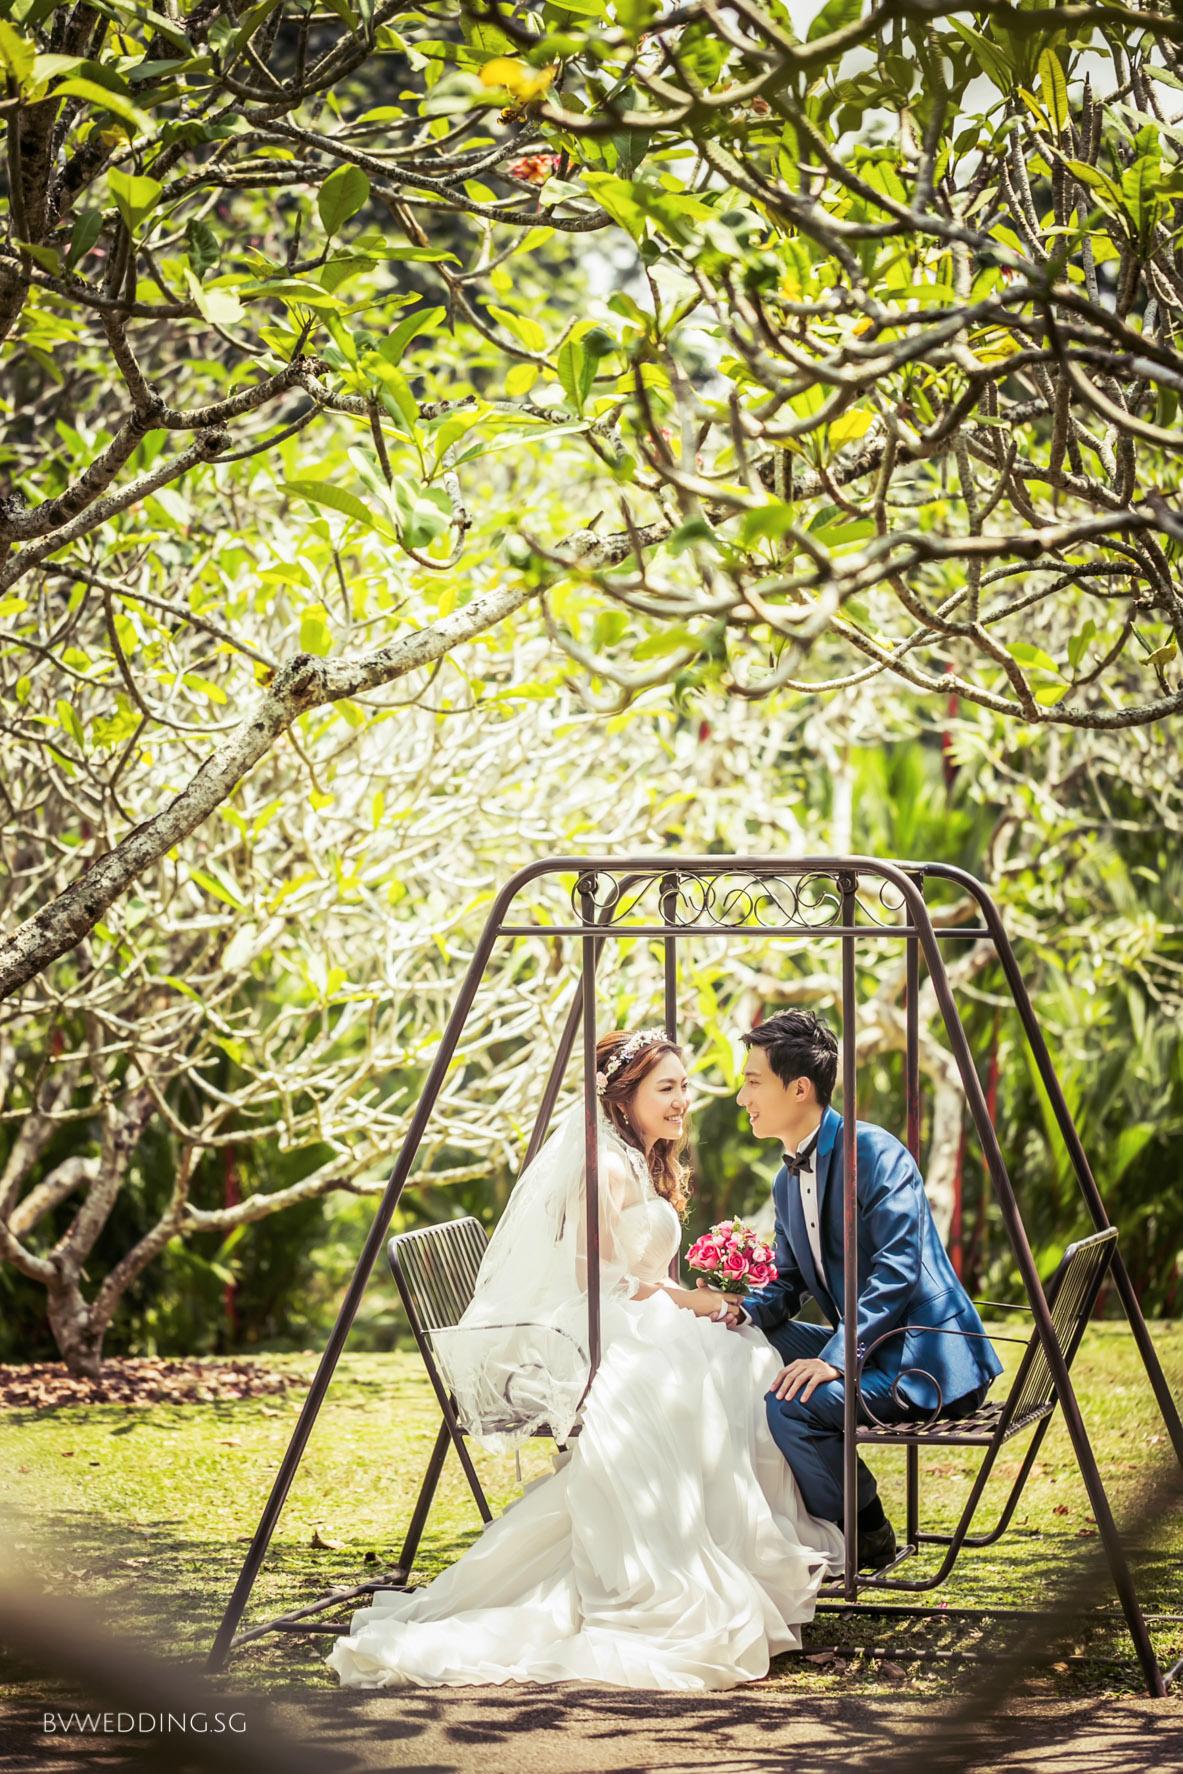 Pre-wedding Photoshoot at Botanic Gardens